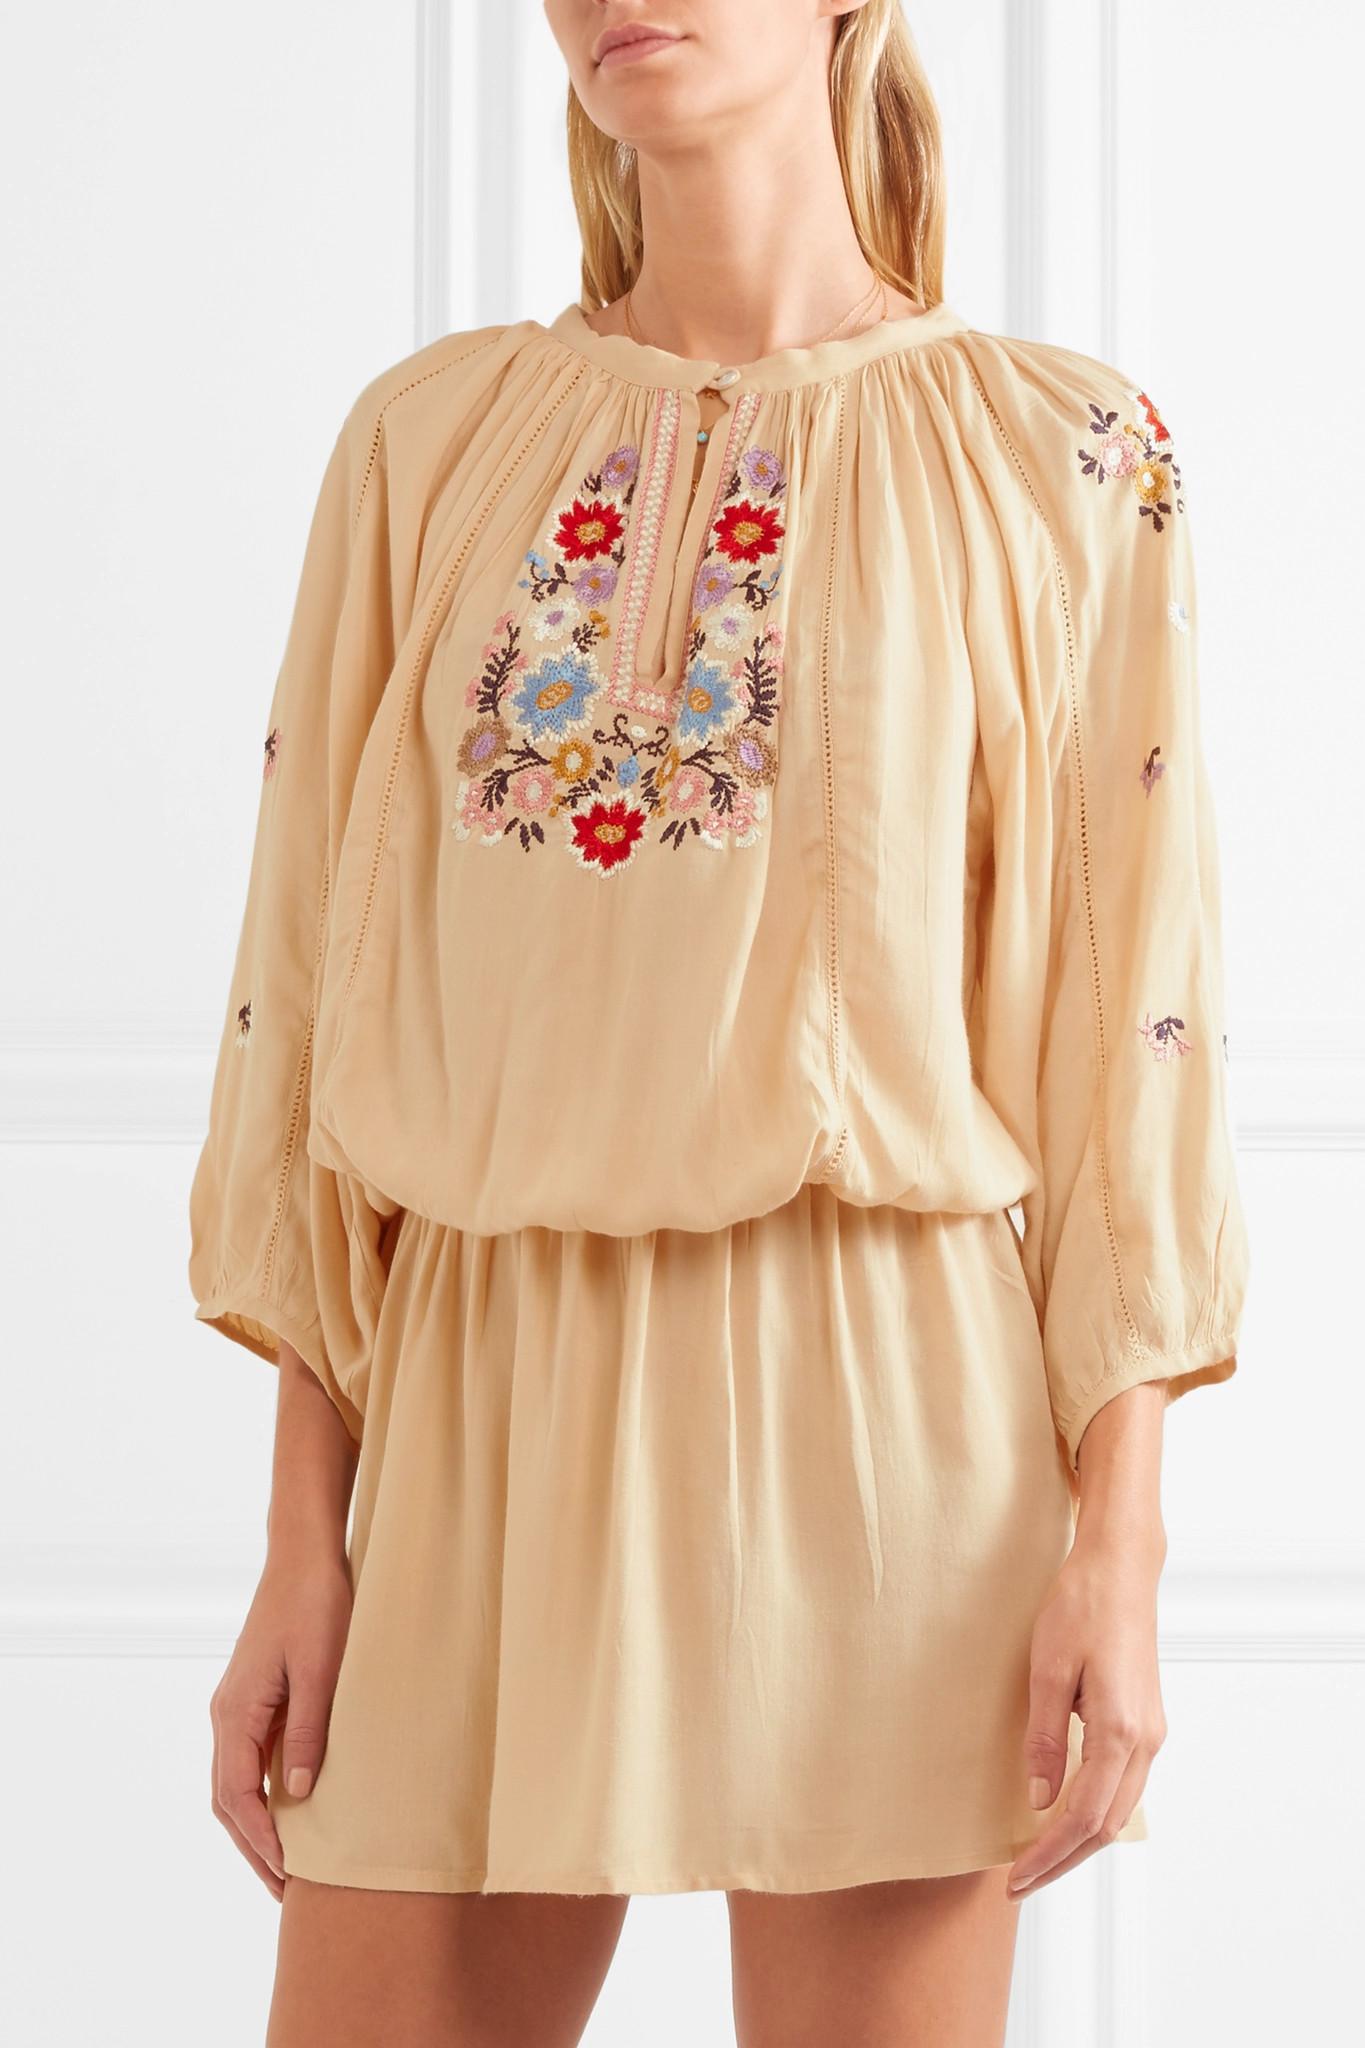 Melissa Odabash Woman Nadja Embroidered Voile Mini Dress Beige Size L Melissa Odabash pdervwgI5